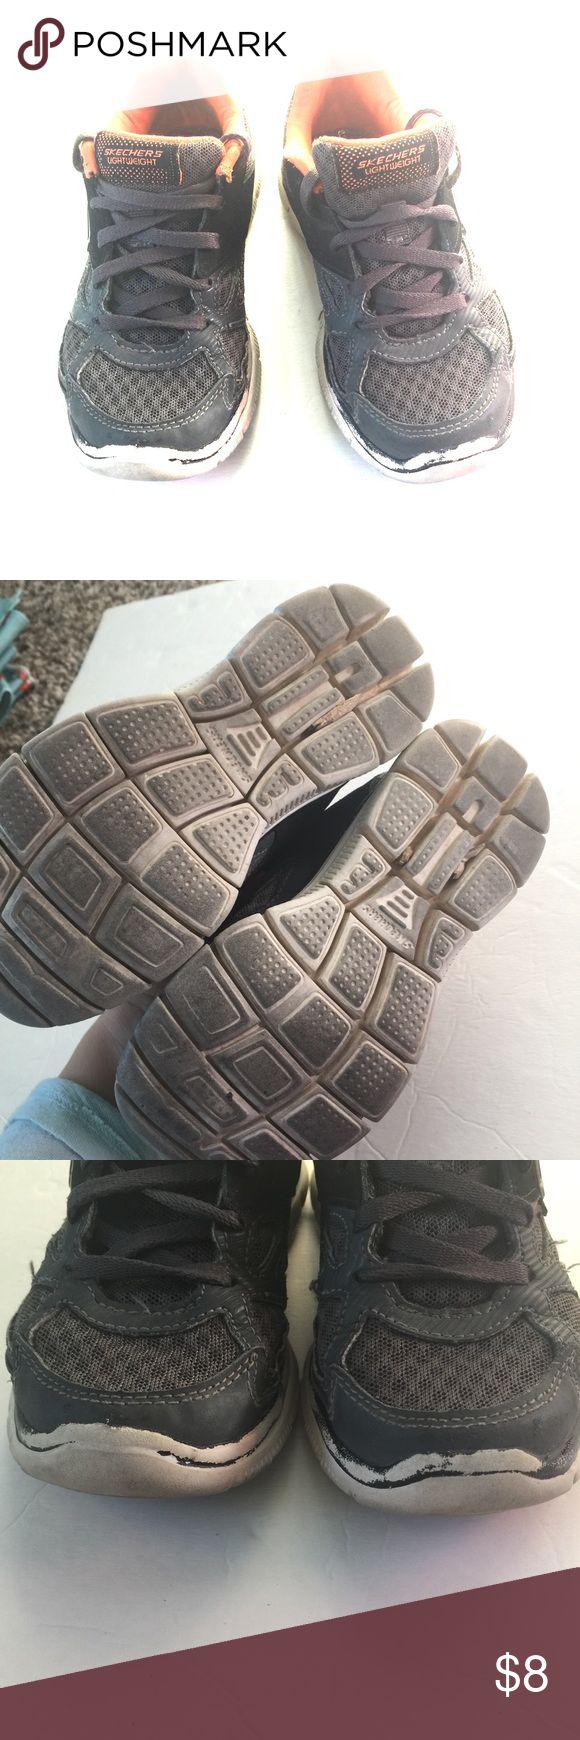 Skechers shoes Sneaker tennis shoes lace up show wear on soles Skechers Shoes Sneakers